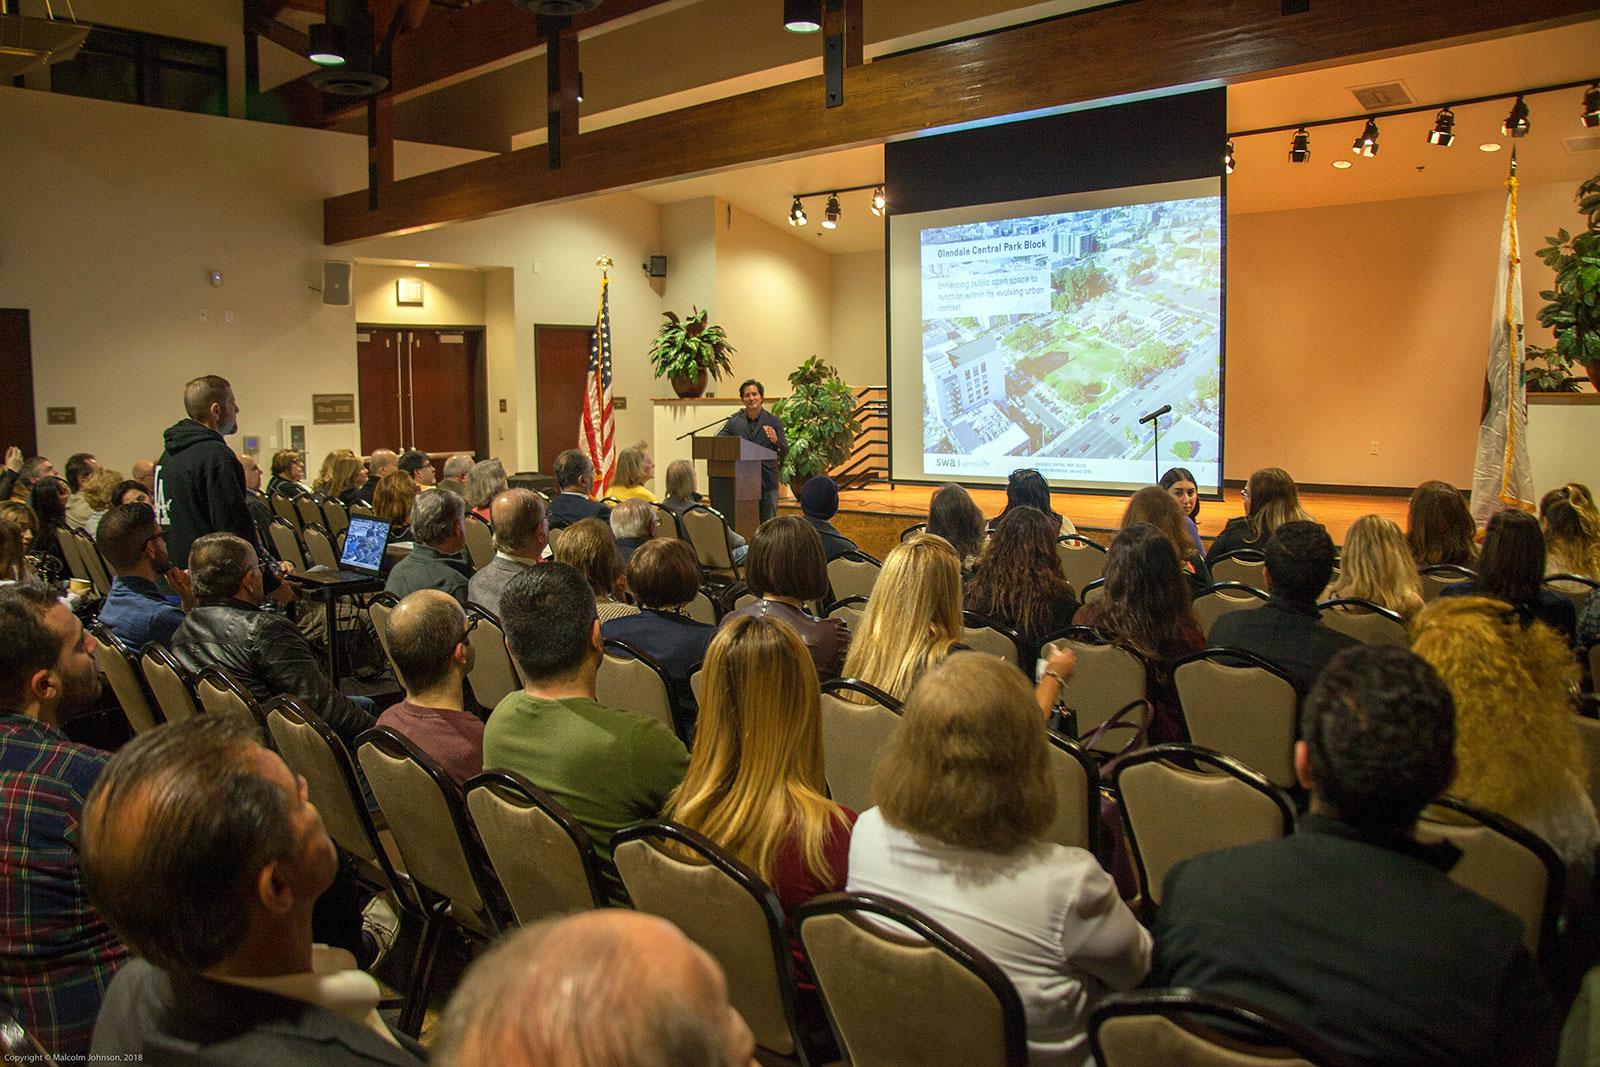 Glendale Central Park Community Meeting Jan 18